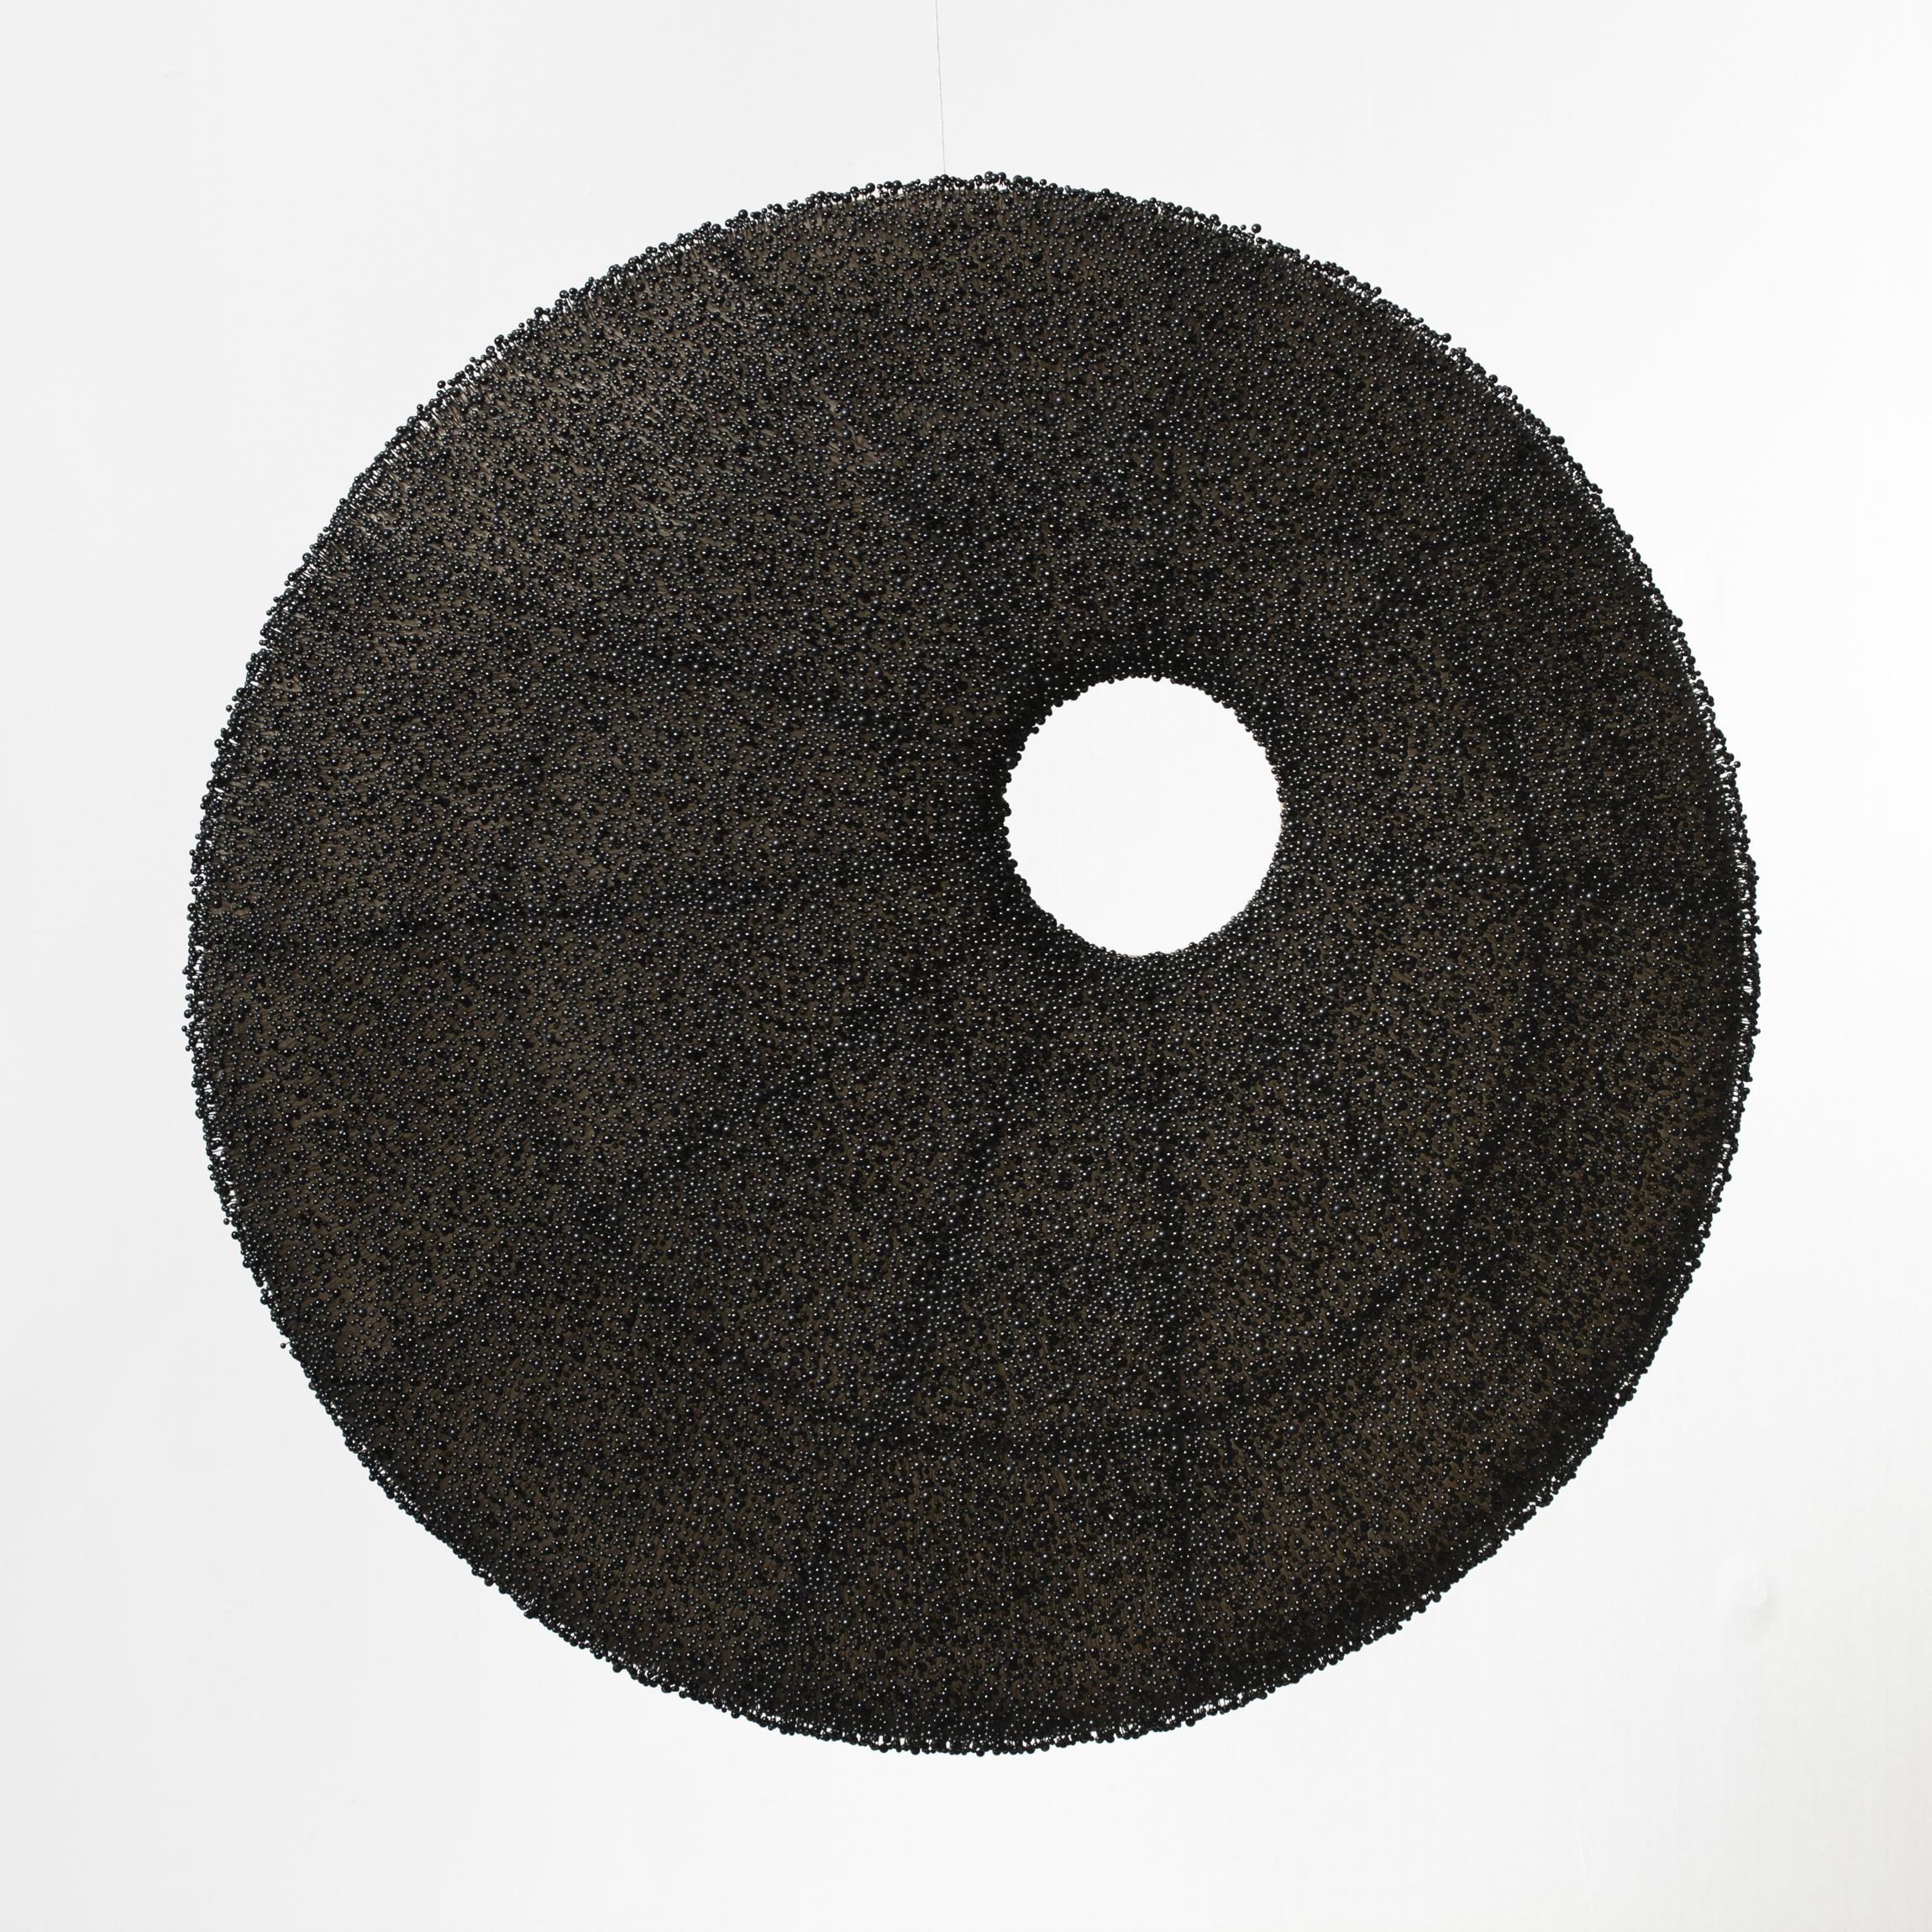 "Elements, front, black glass head pins, steel frame, linen and wax, 2.5'diameter x 8"" deep, 2006/2012"